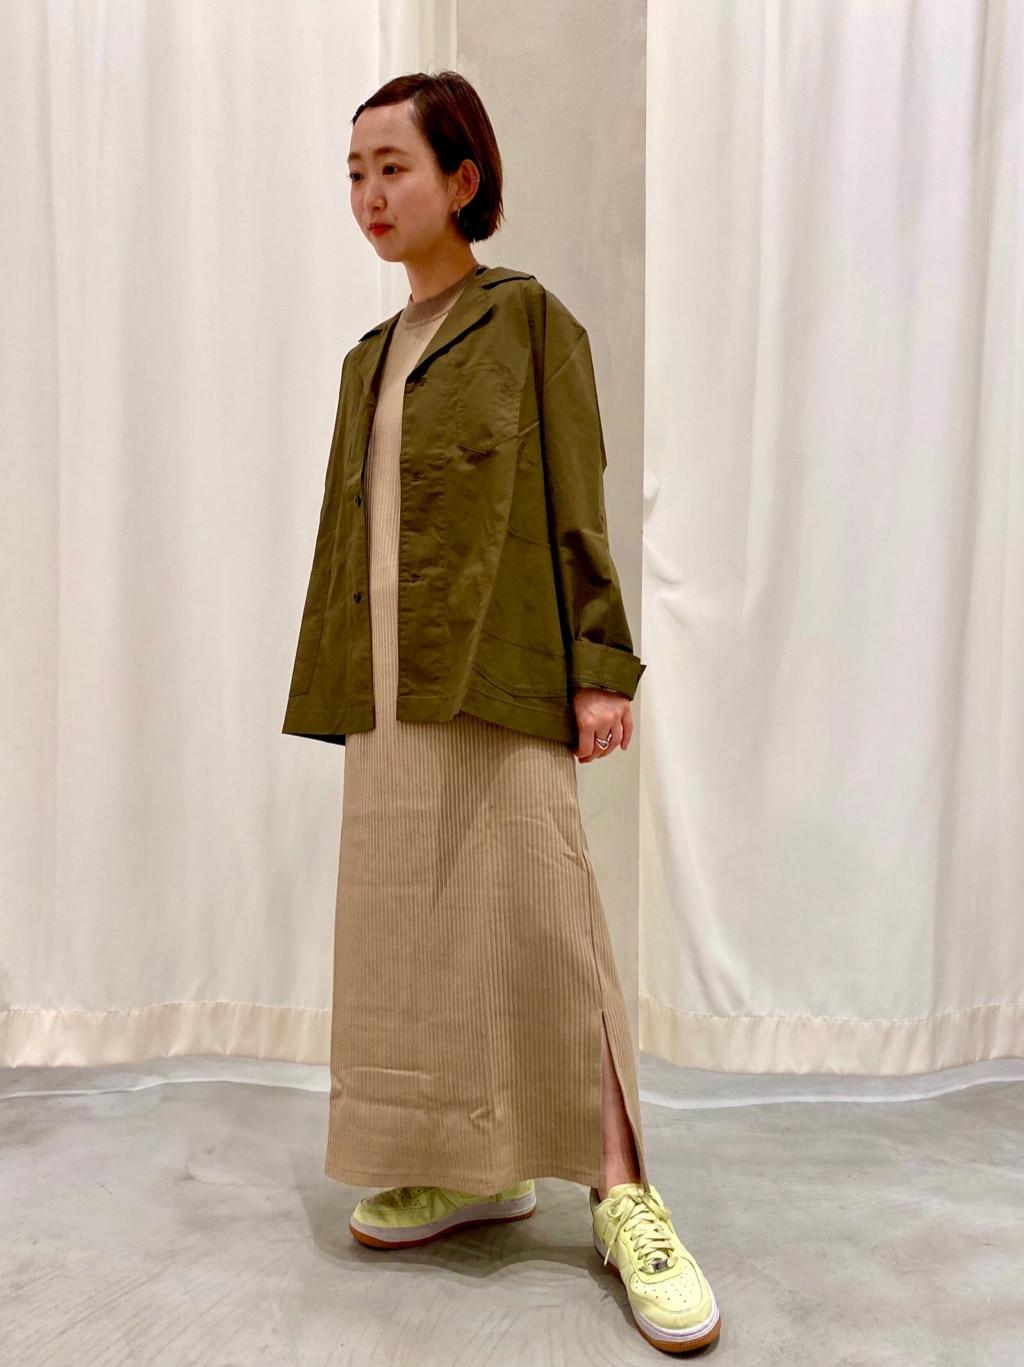 CHILD WOMAN , PAR ICI 東京スカイツリータウン・ソラマチ 2020.06.19